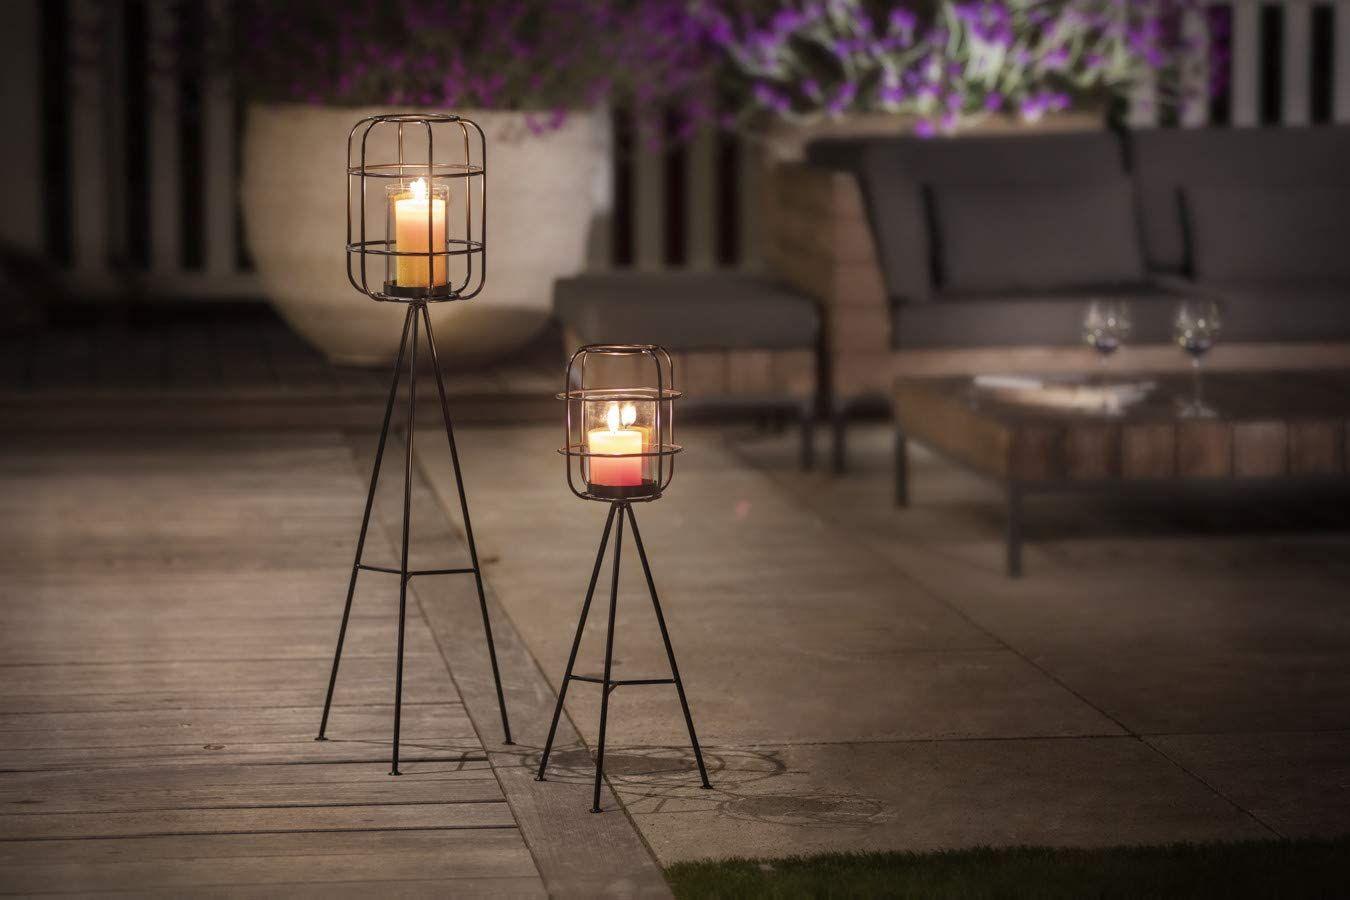 Lifa Living Grosse Kerzenhalter Fur Wohnzimmer Garten Modernes 2er Set Standleuchten Im Vintagestil Vogelkafig Kerzenleuc Kerzenleuchter Kerzen Kerzenhalter